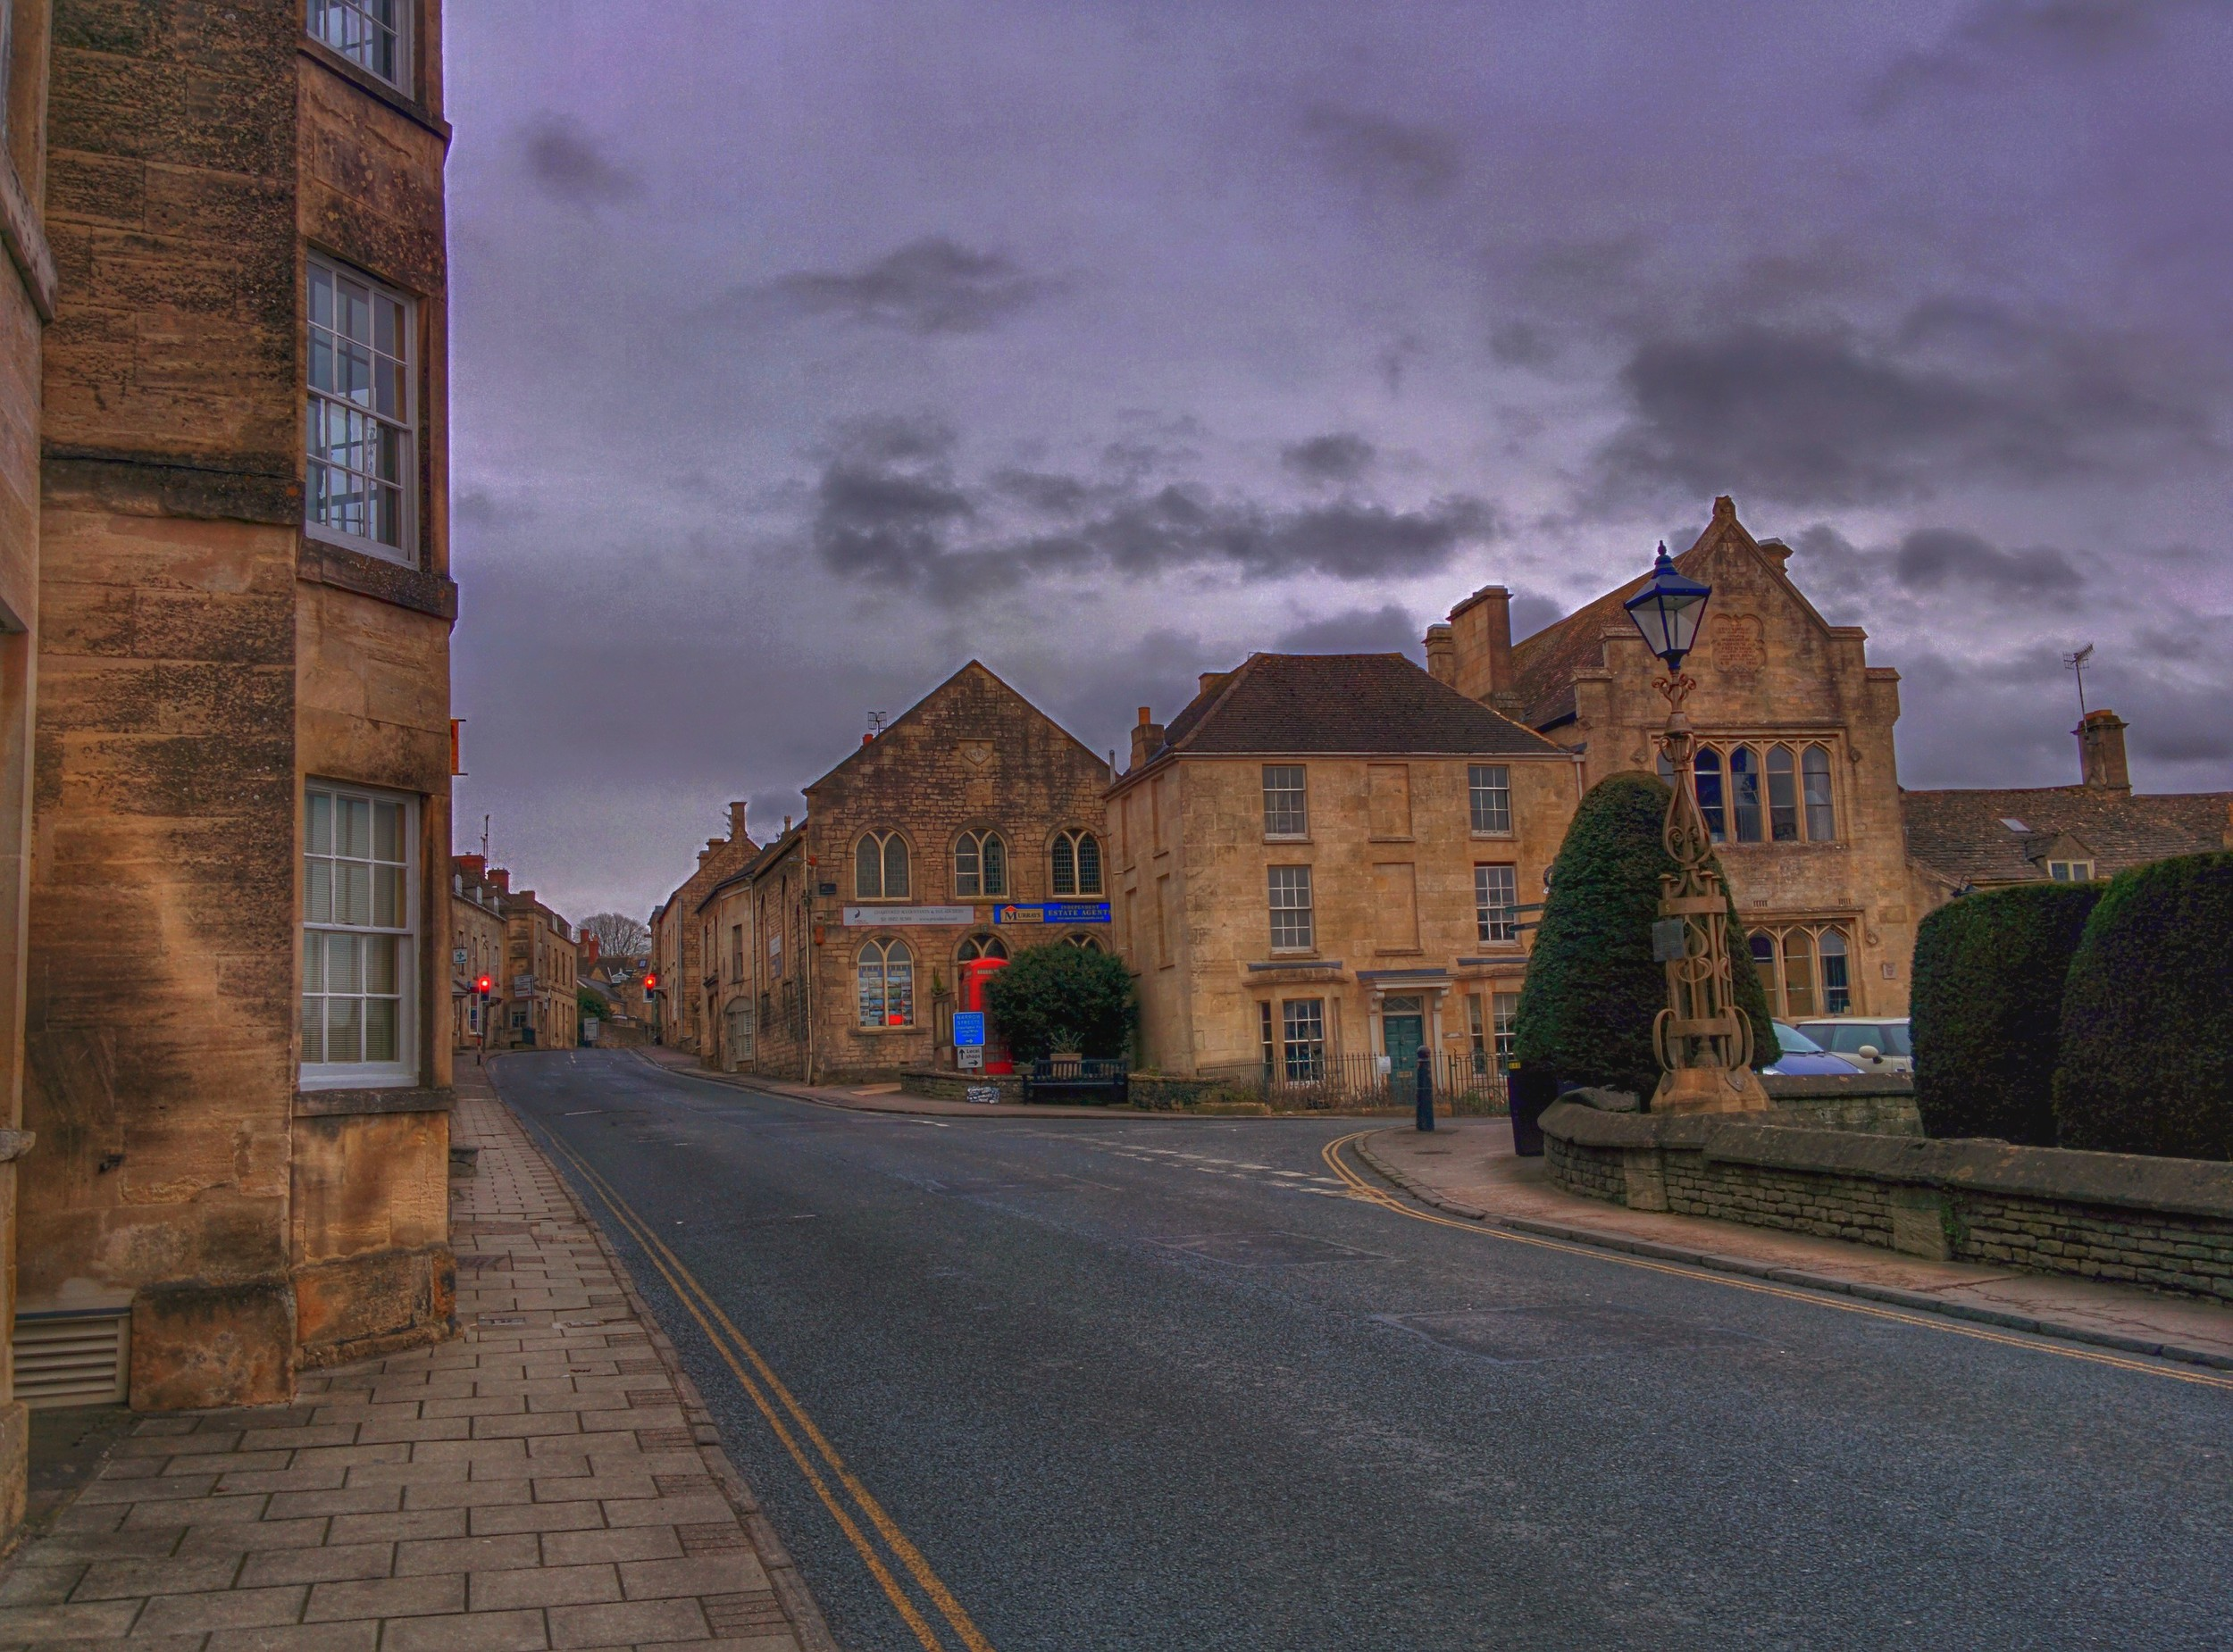 Painswick: Main street